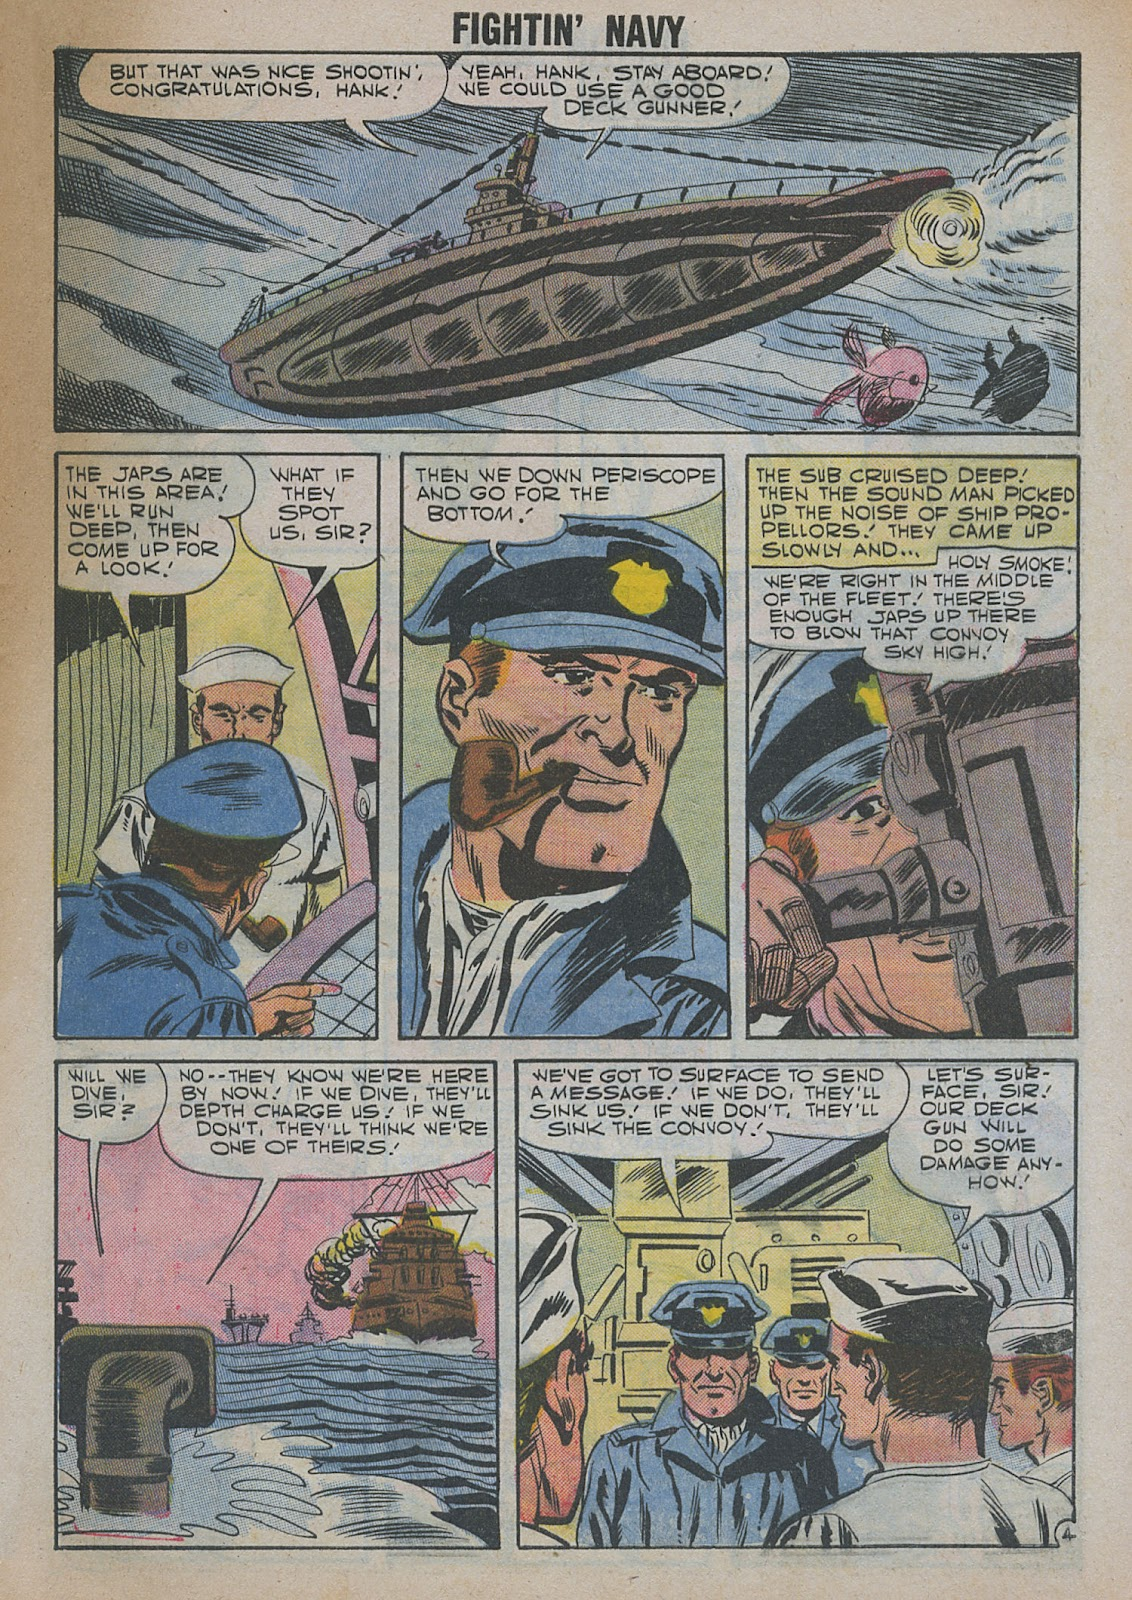 Read online Fightin' Navy comic -  Issue #82 - 57